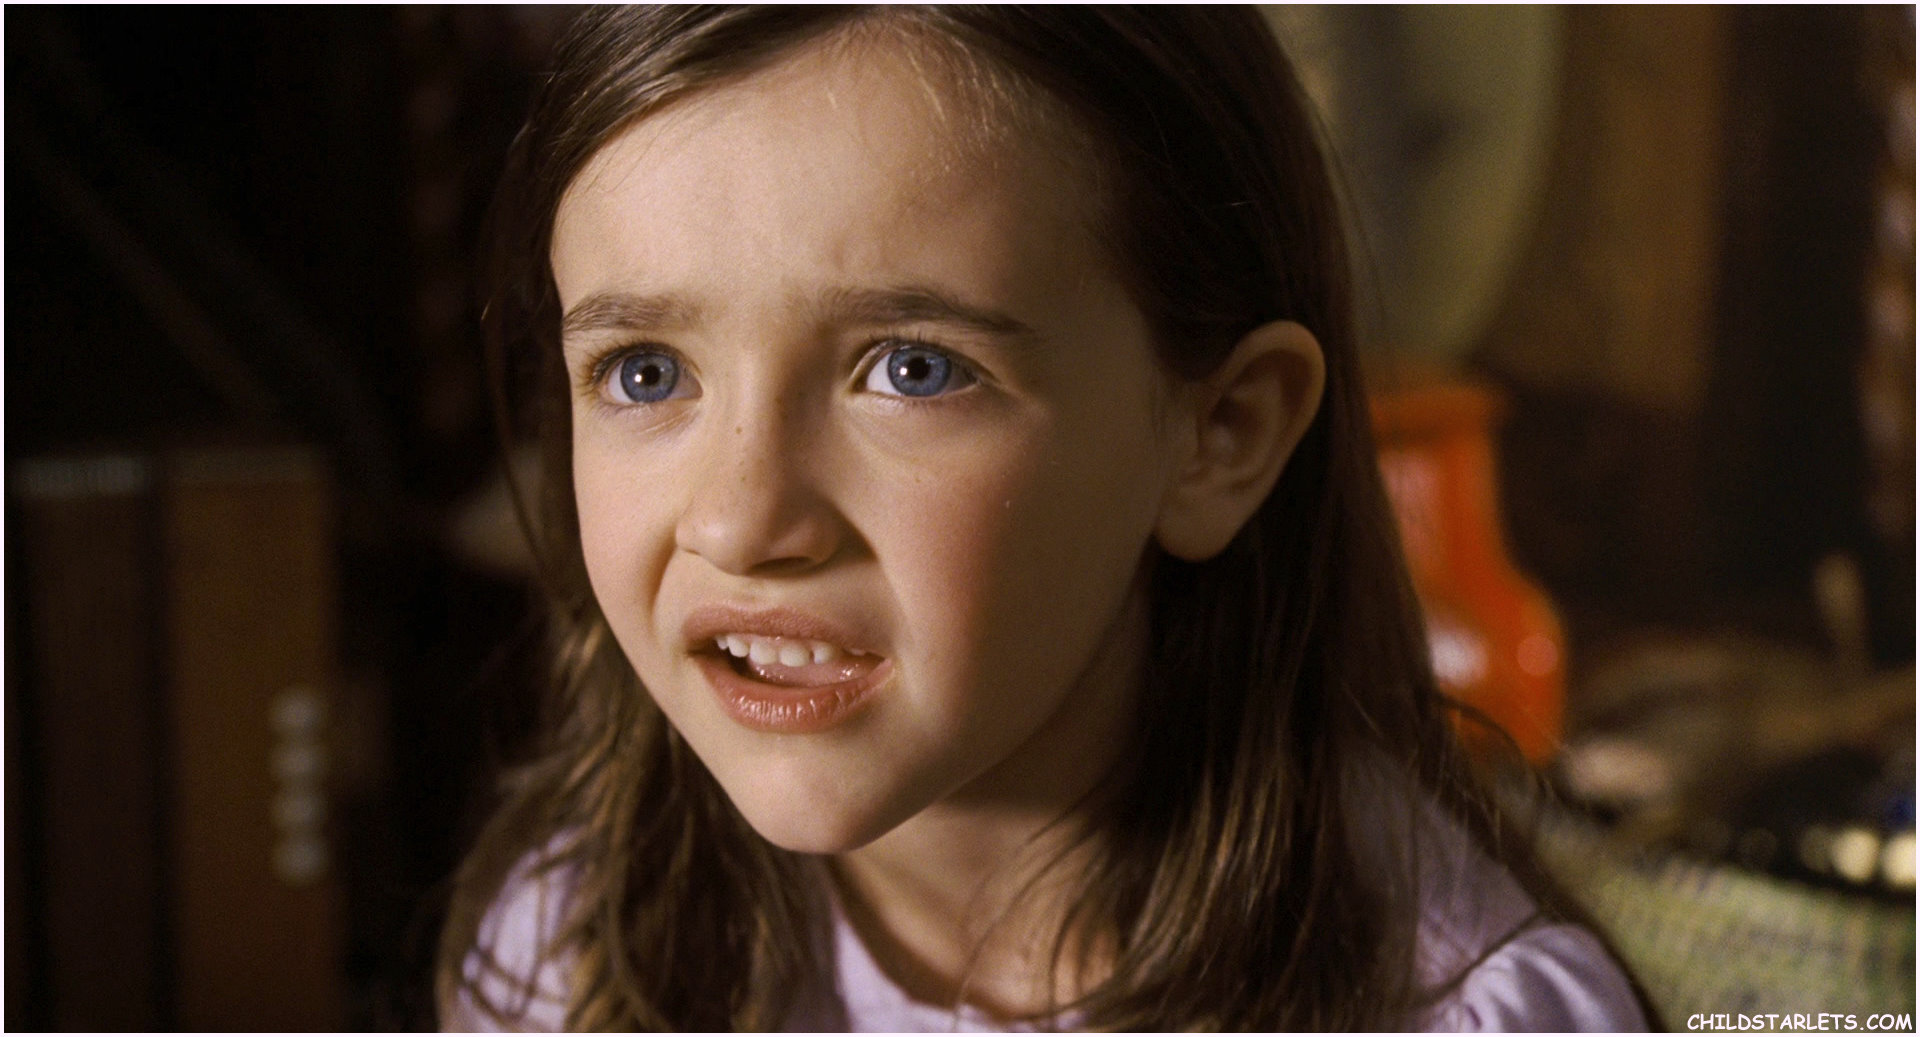 ashley boettcher child actress imagesphotospictures